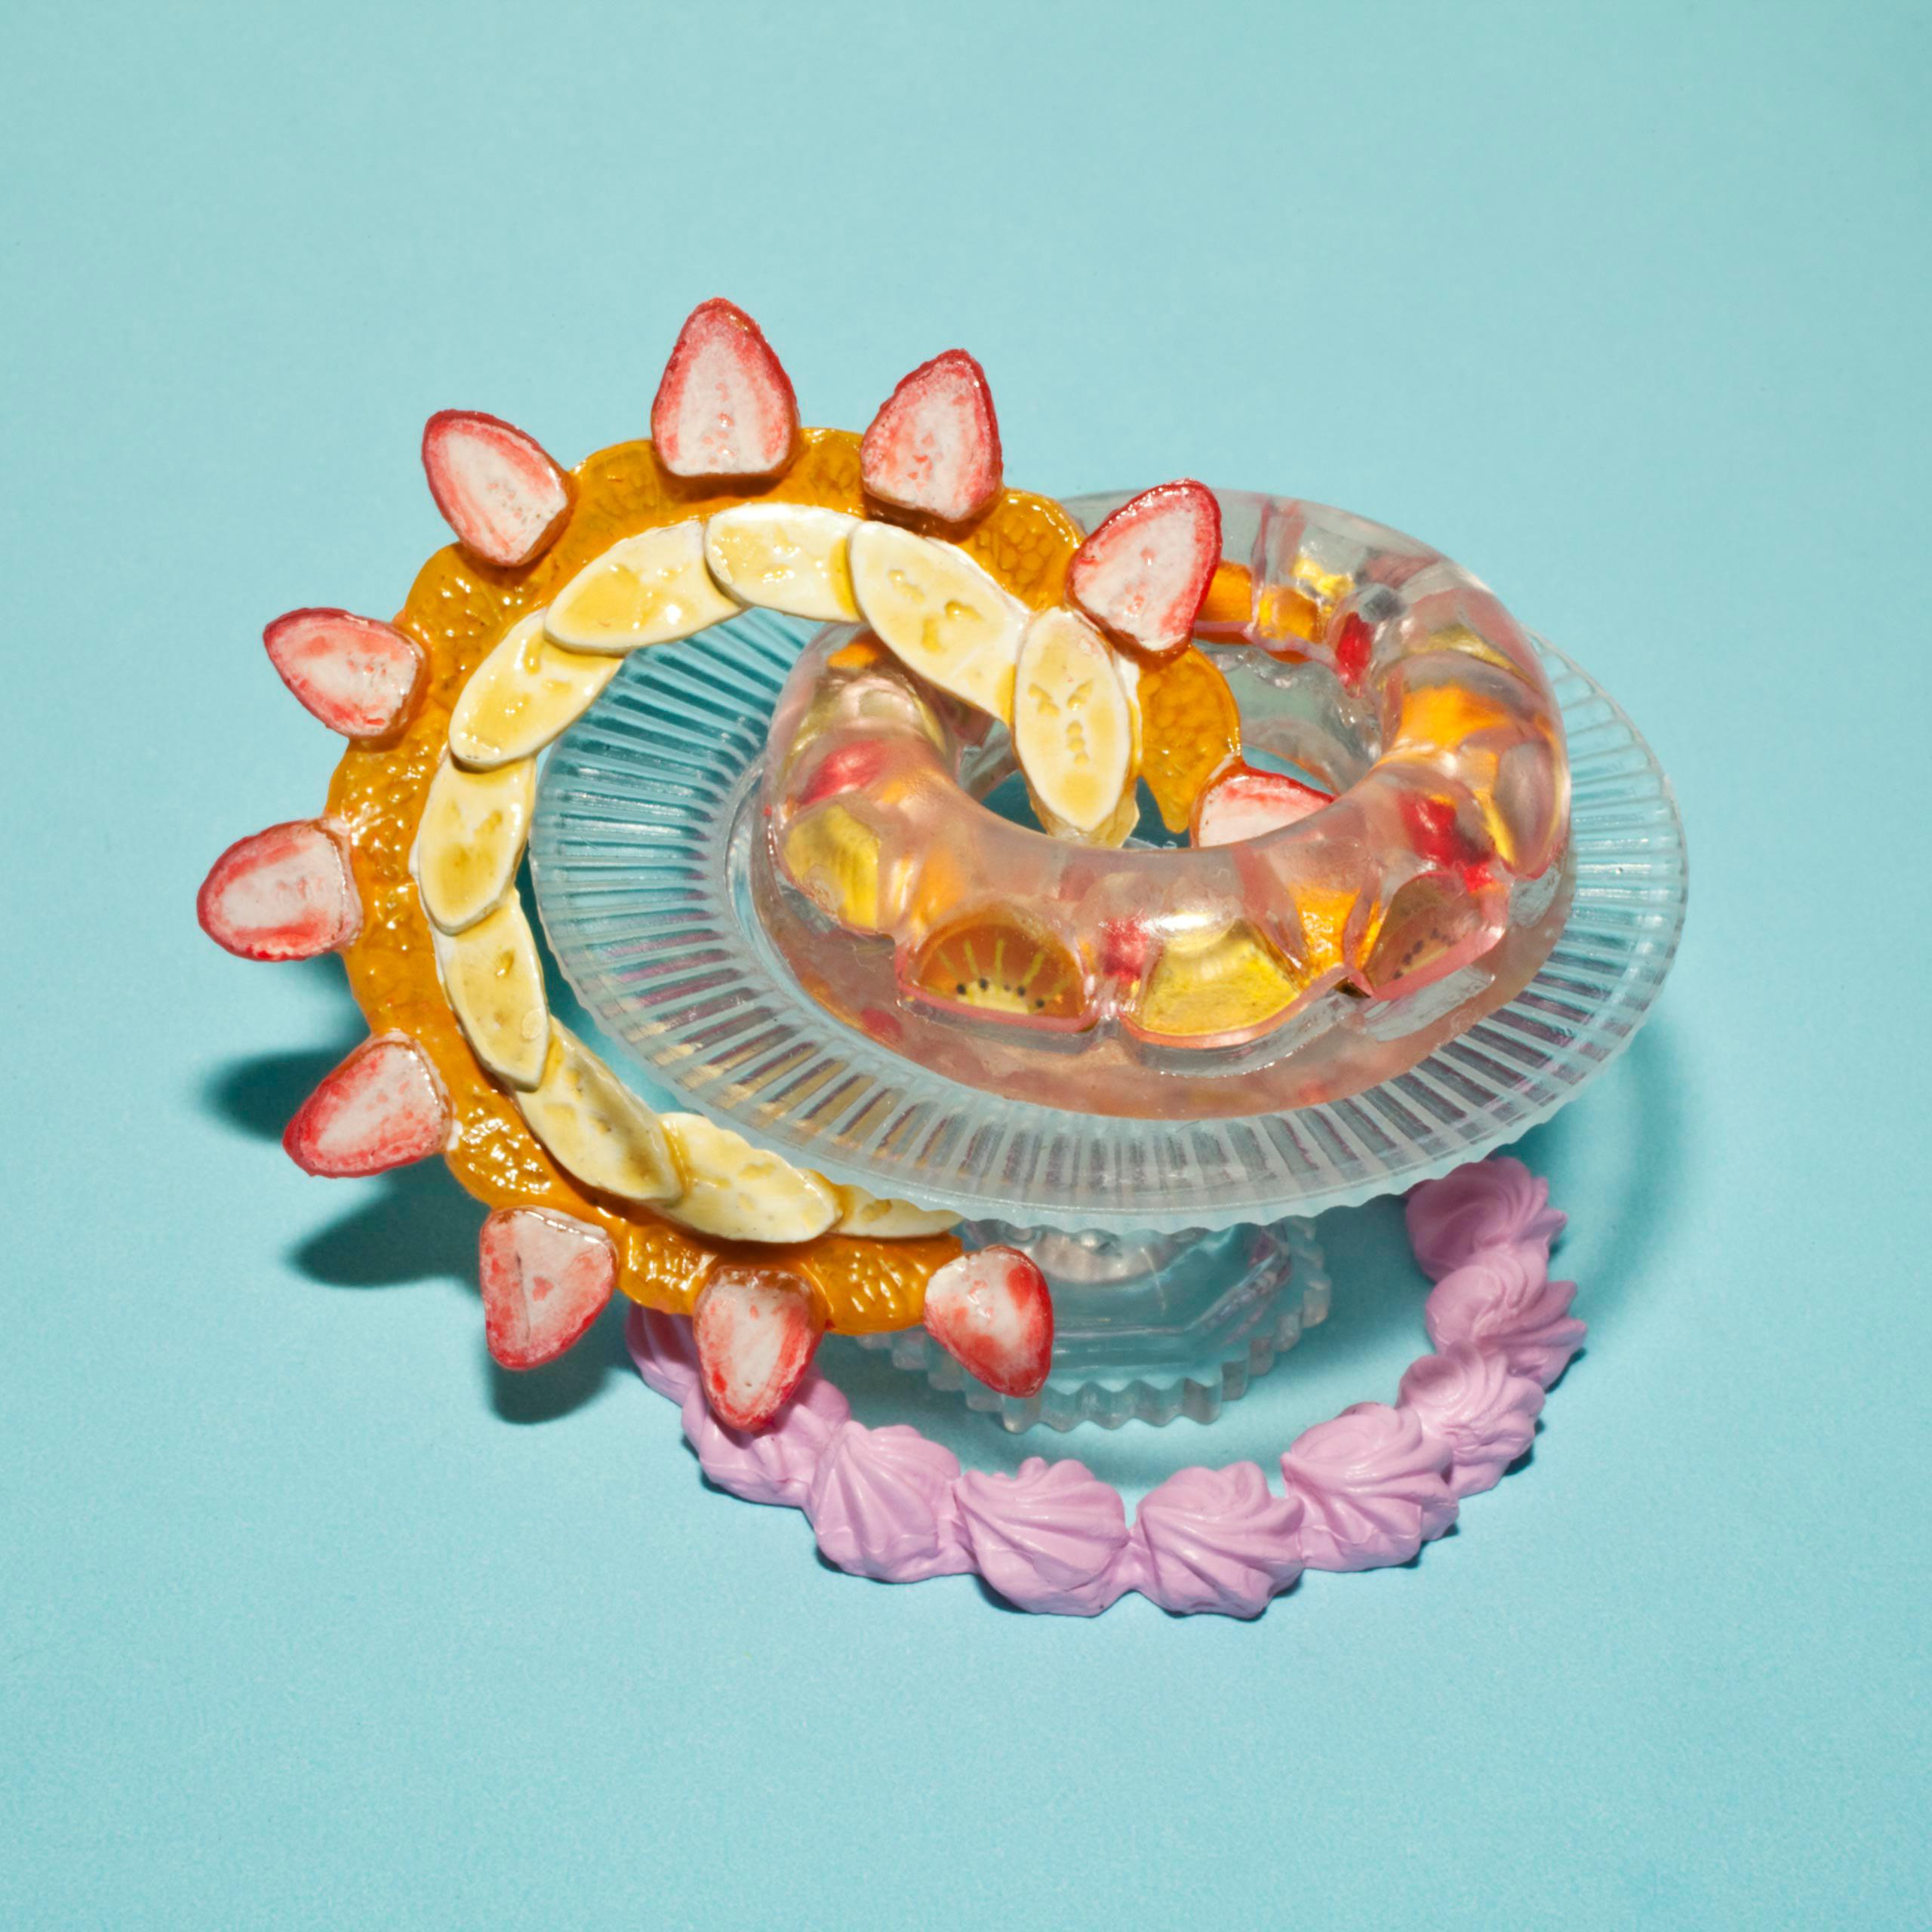 #jelly #jello #fruity #fruto #thingsarequeer